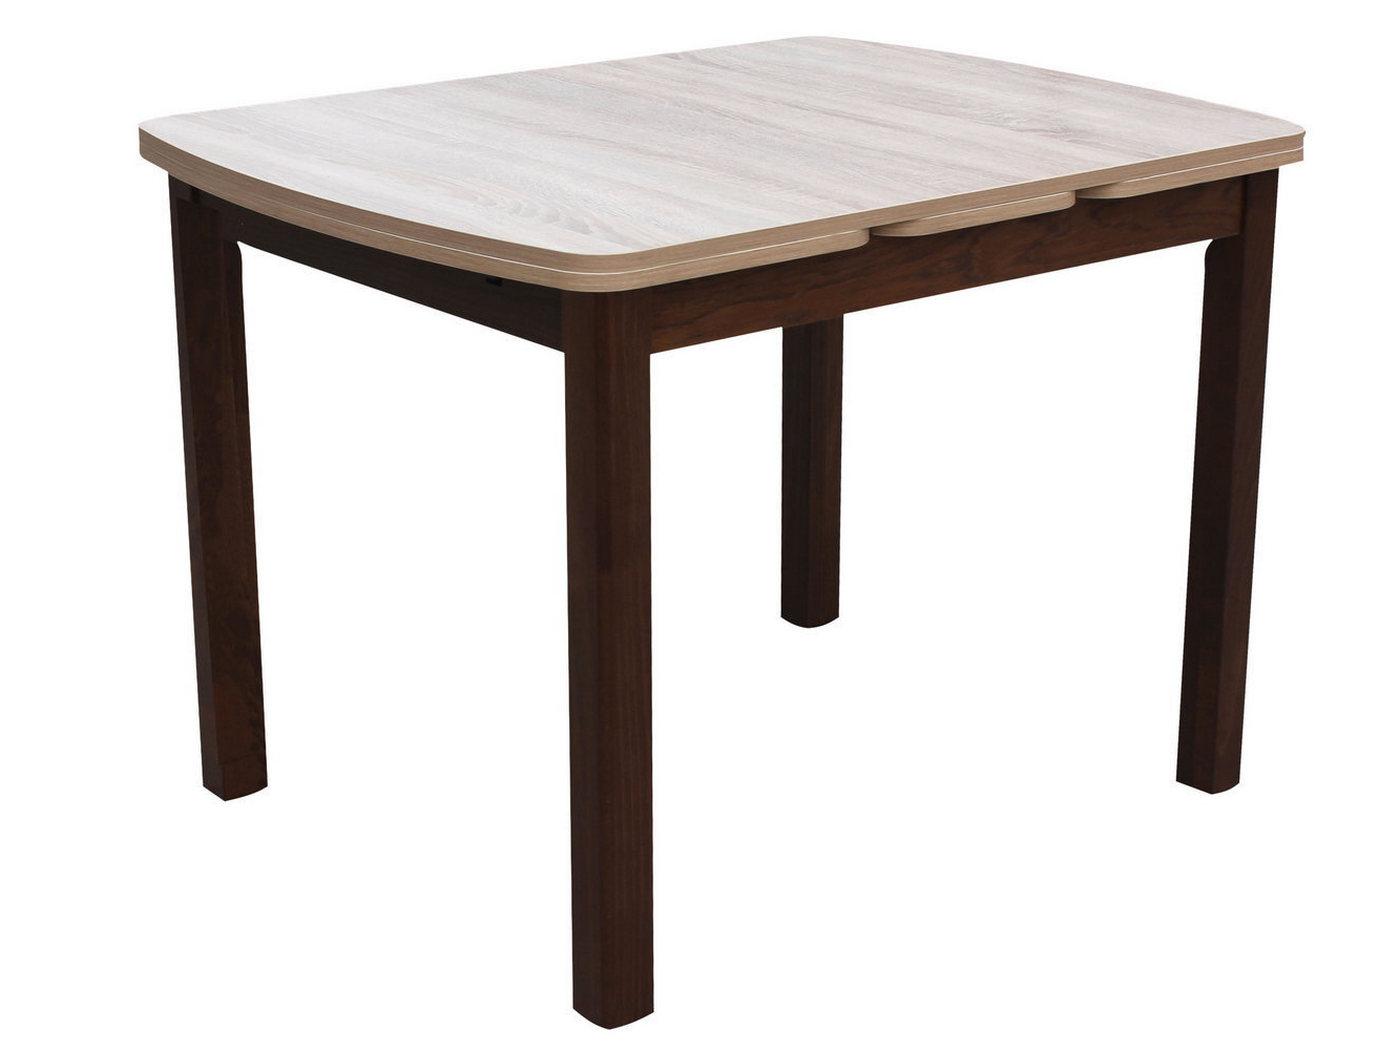 Обеденный стол Mebwill Орлеан 1,7 ЛДСП Орех темный / Дуб Сонома